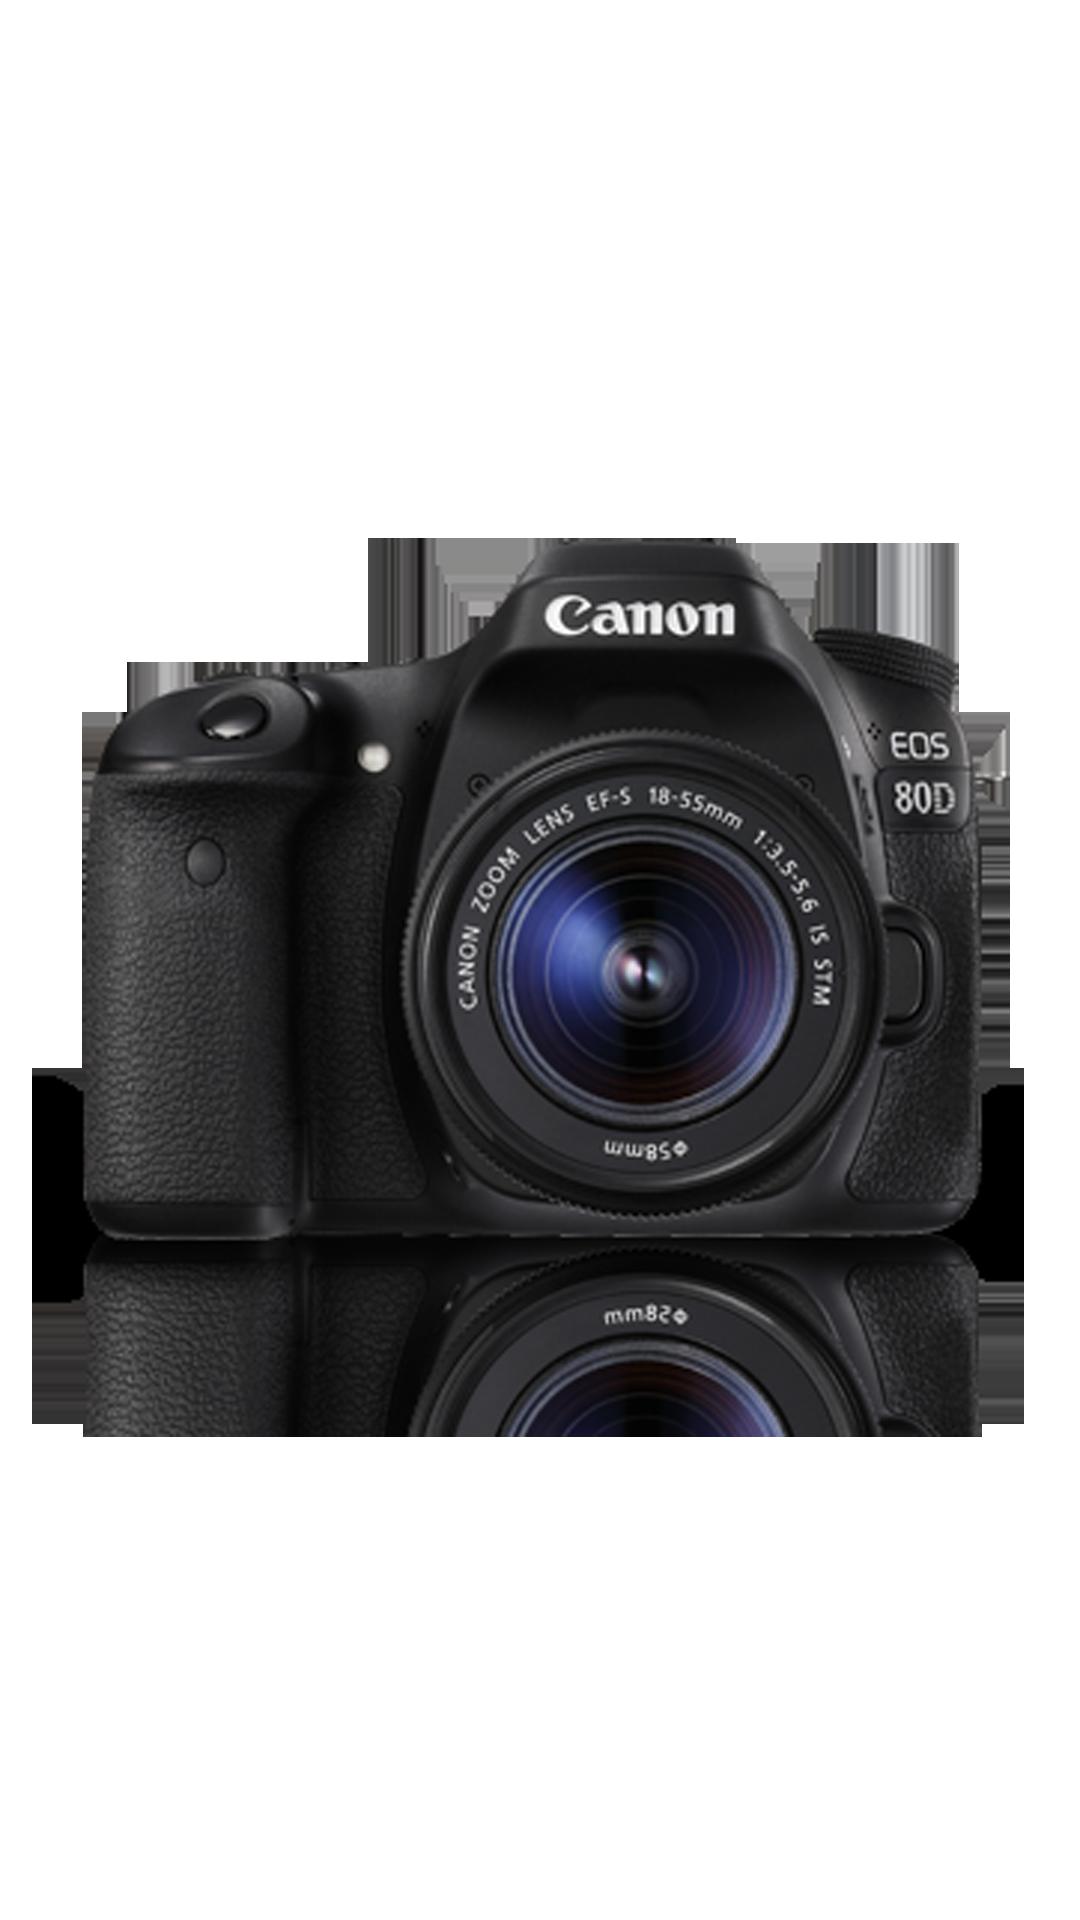 Canon EOS 80D (EF-S18-55 IS STM) 24.2 MP DSLR Camera (Black)